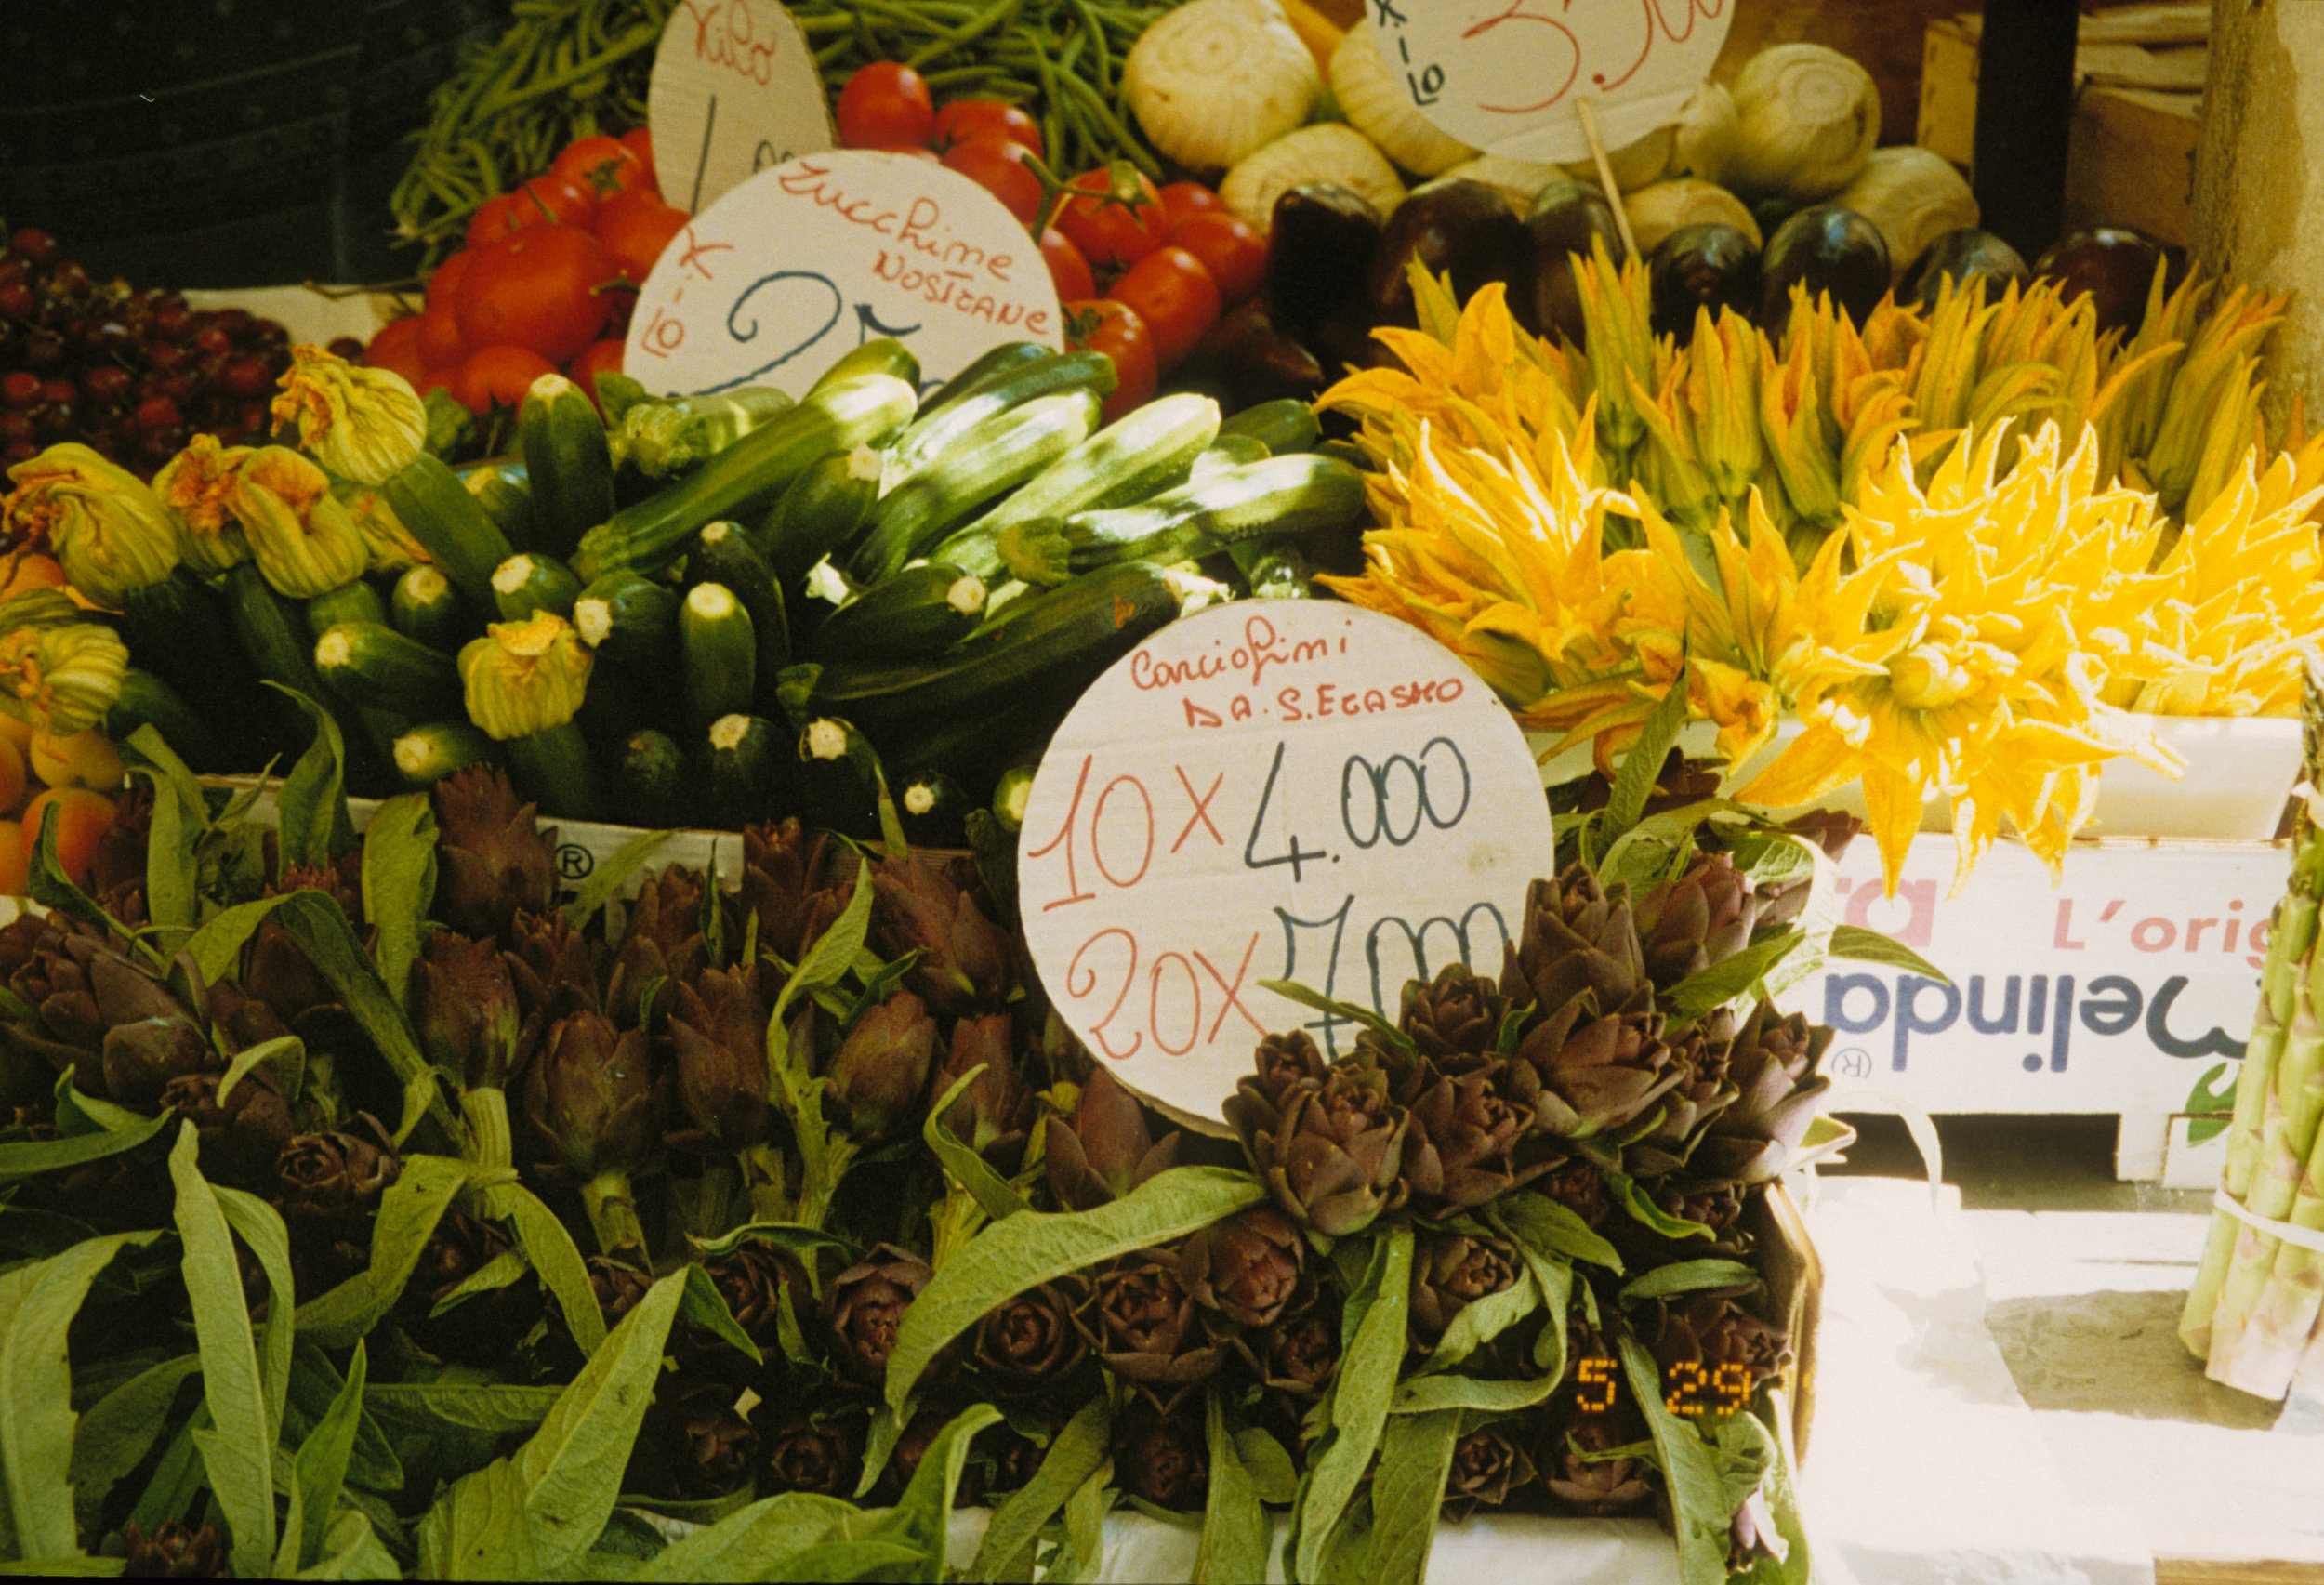 Spring Time Italian Farmers Market